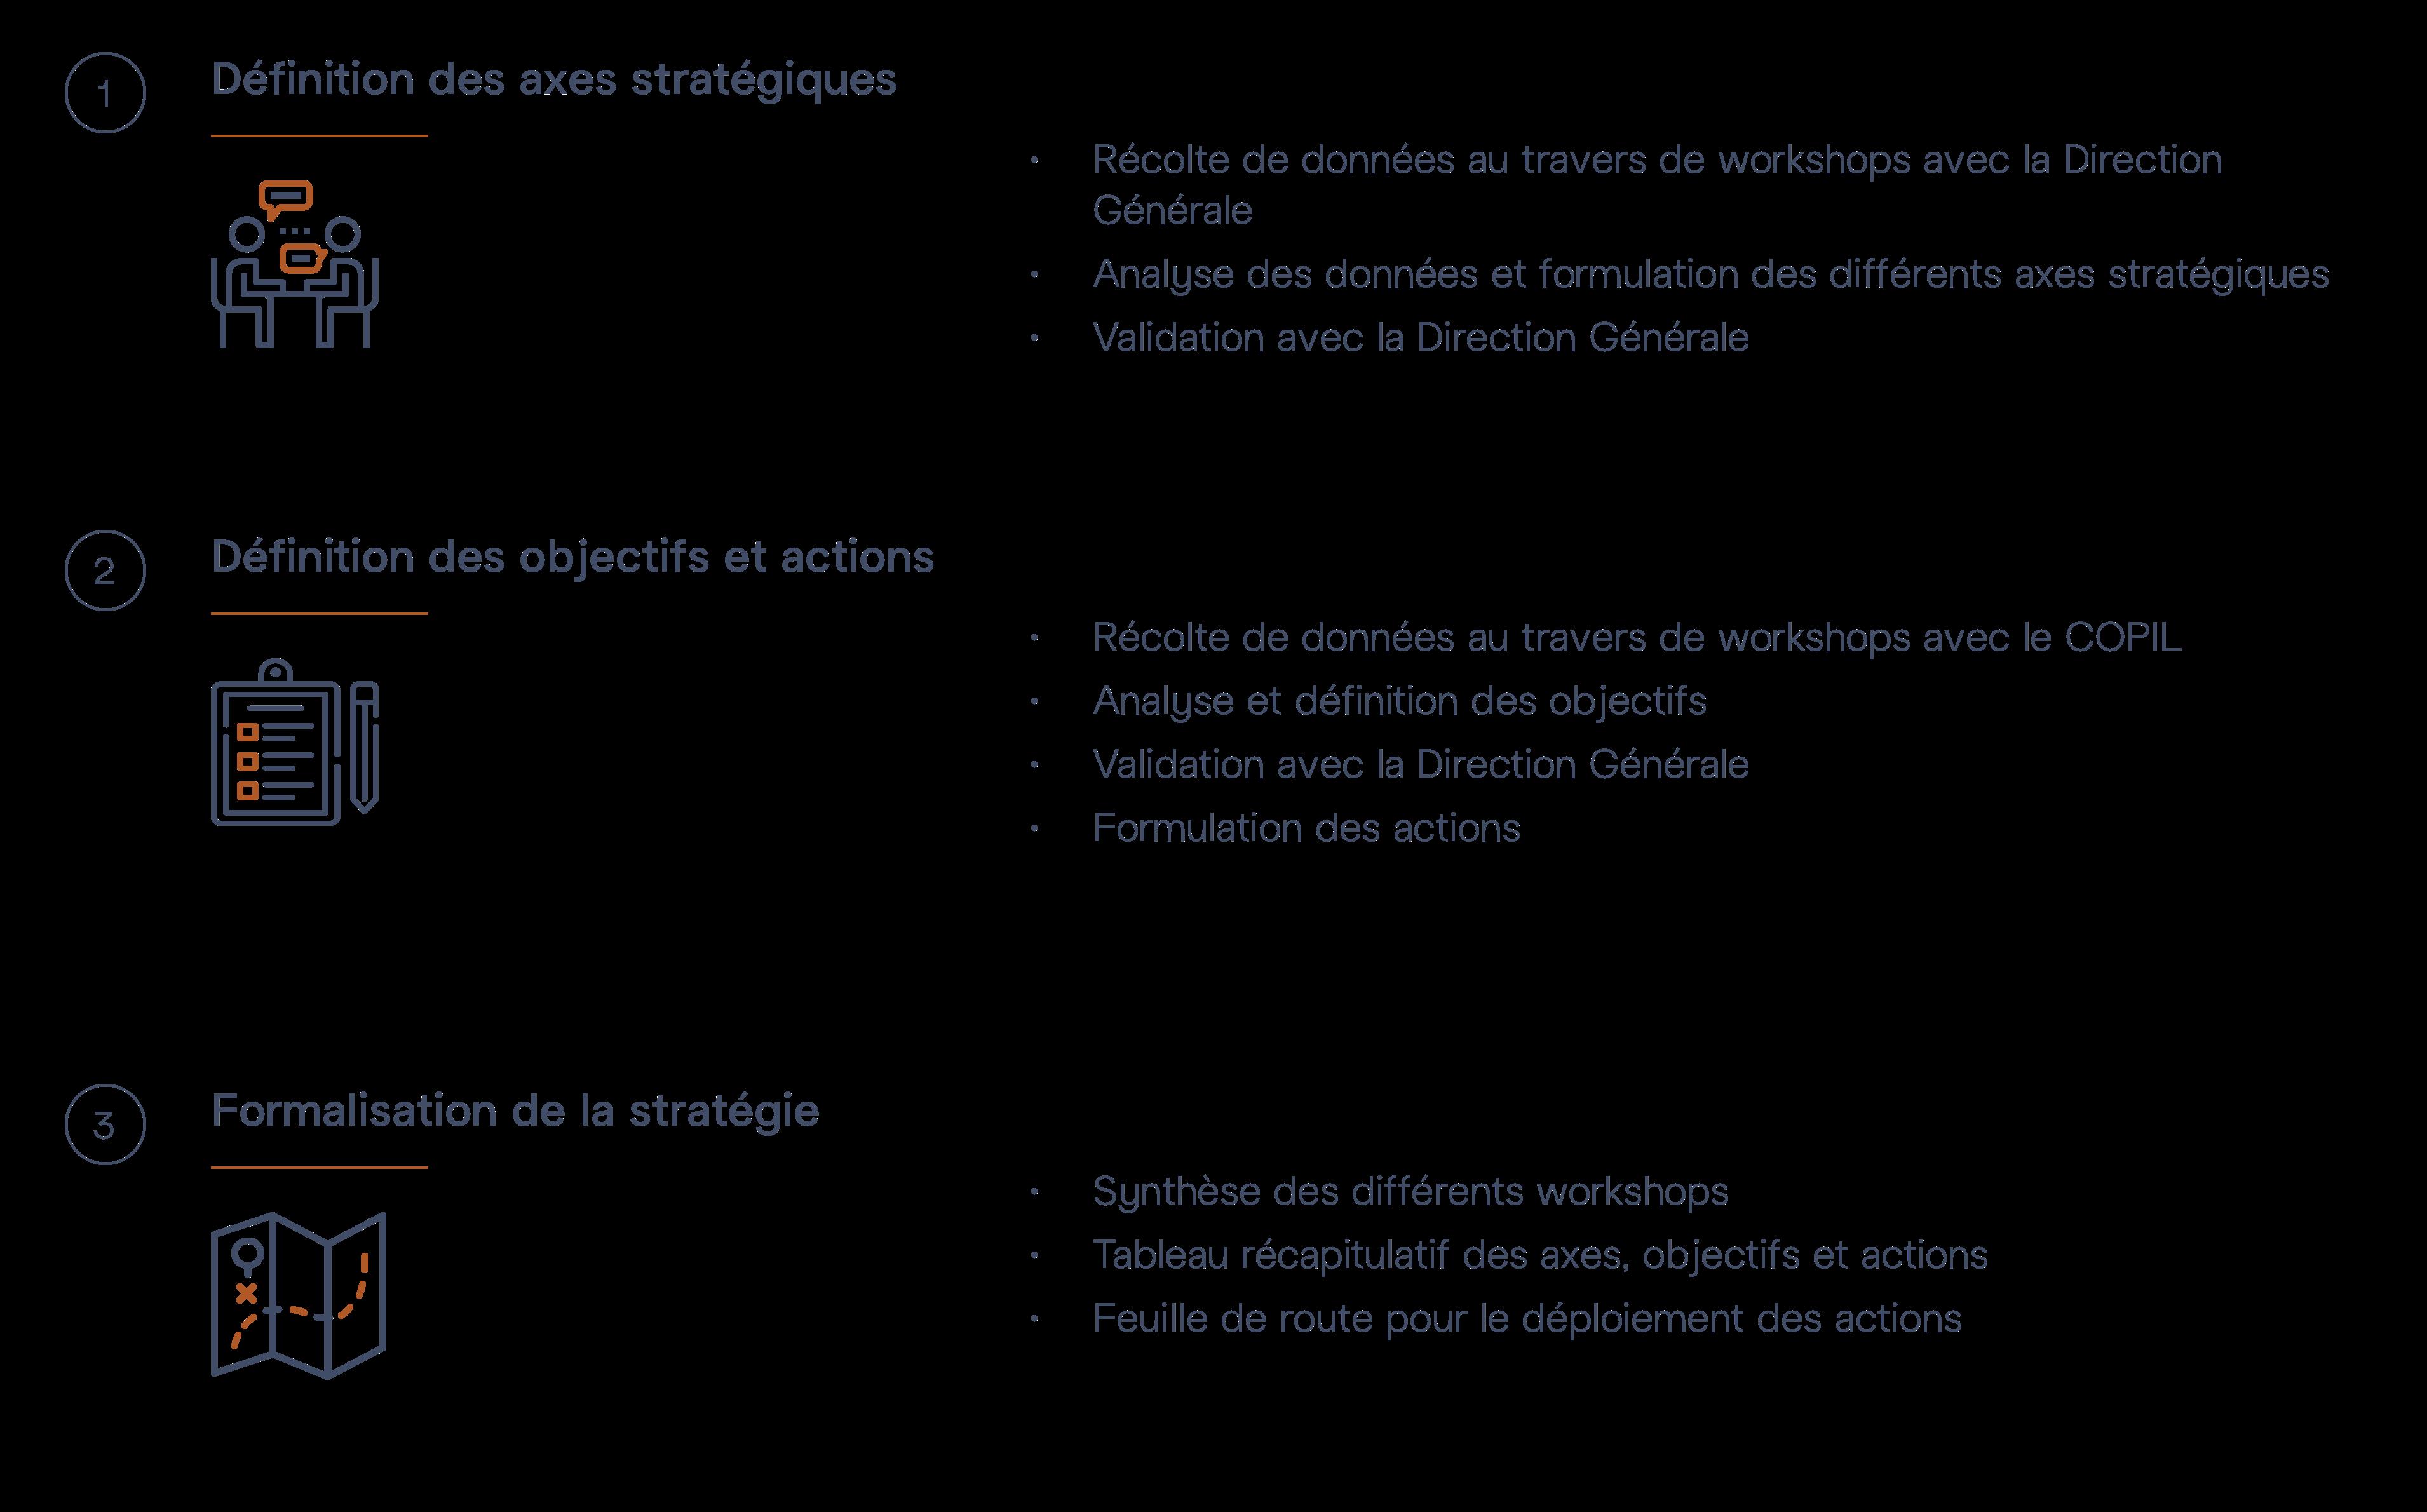 Méthodologie formalisation stratégie d'entreprise